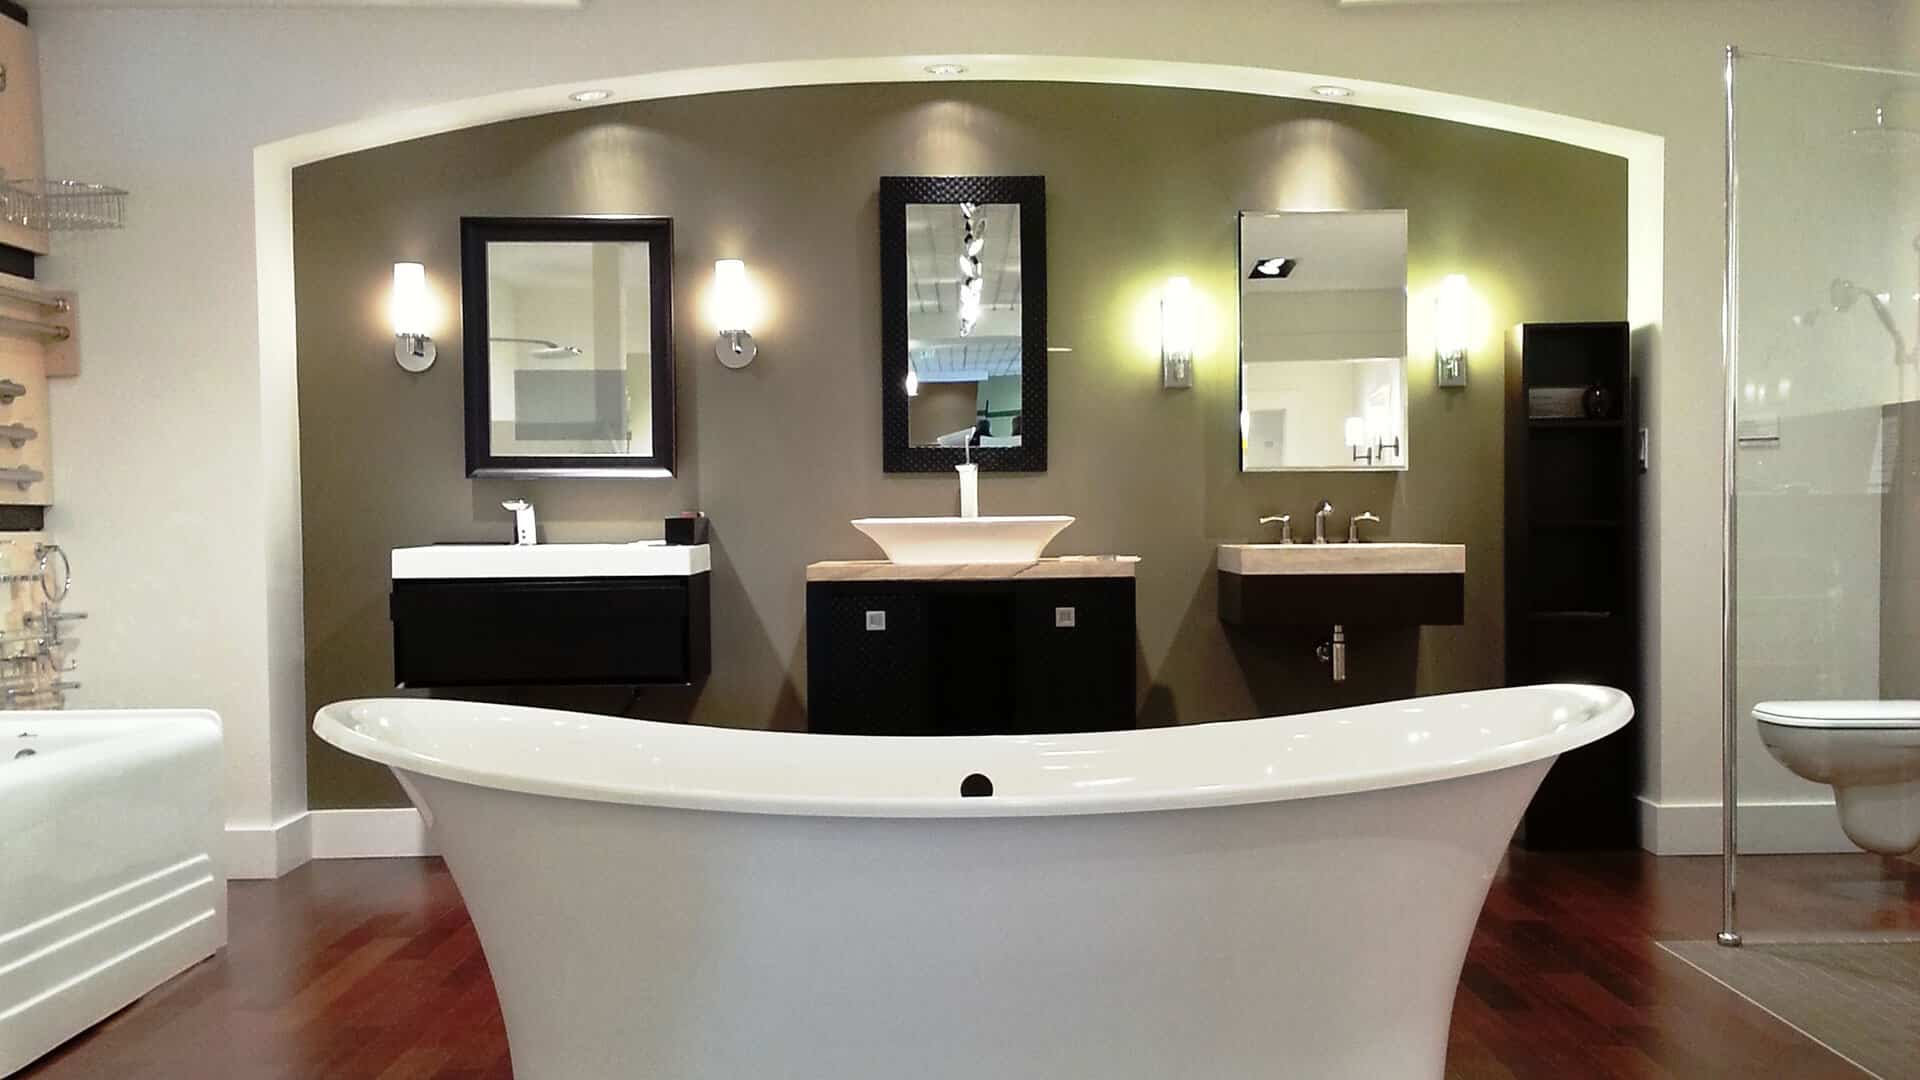 New Fixture Installation Bathroom and Kitchen Seattle